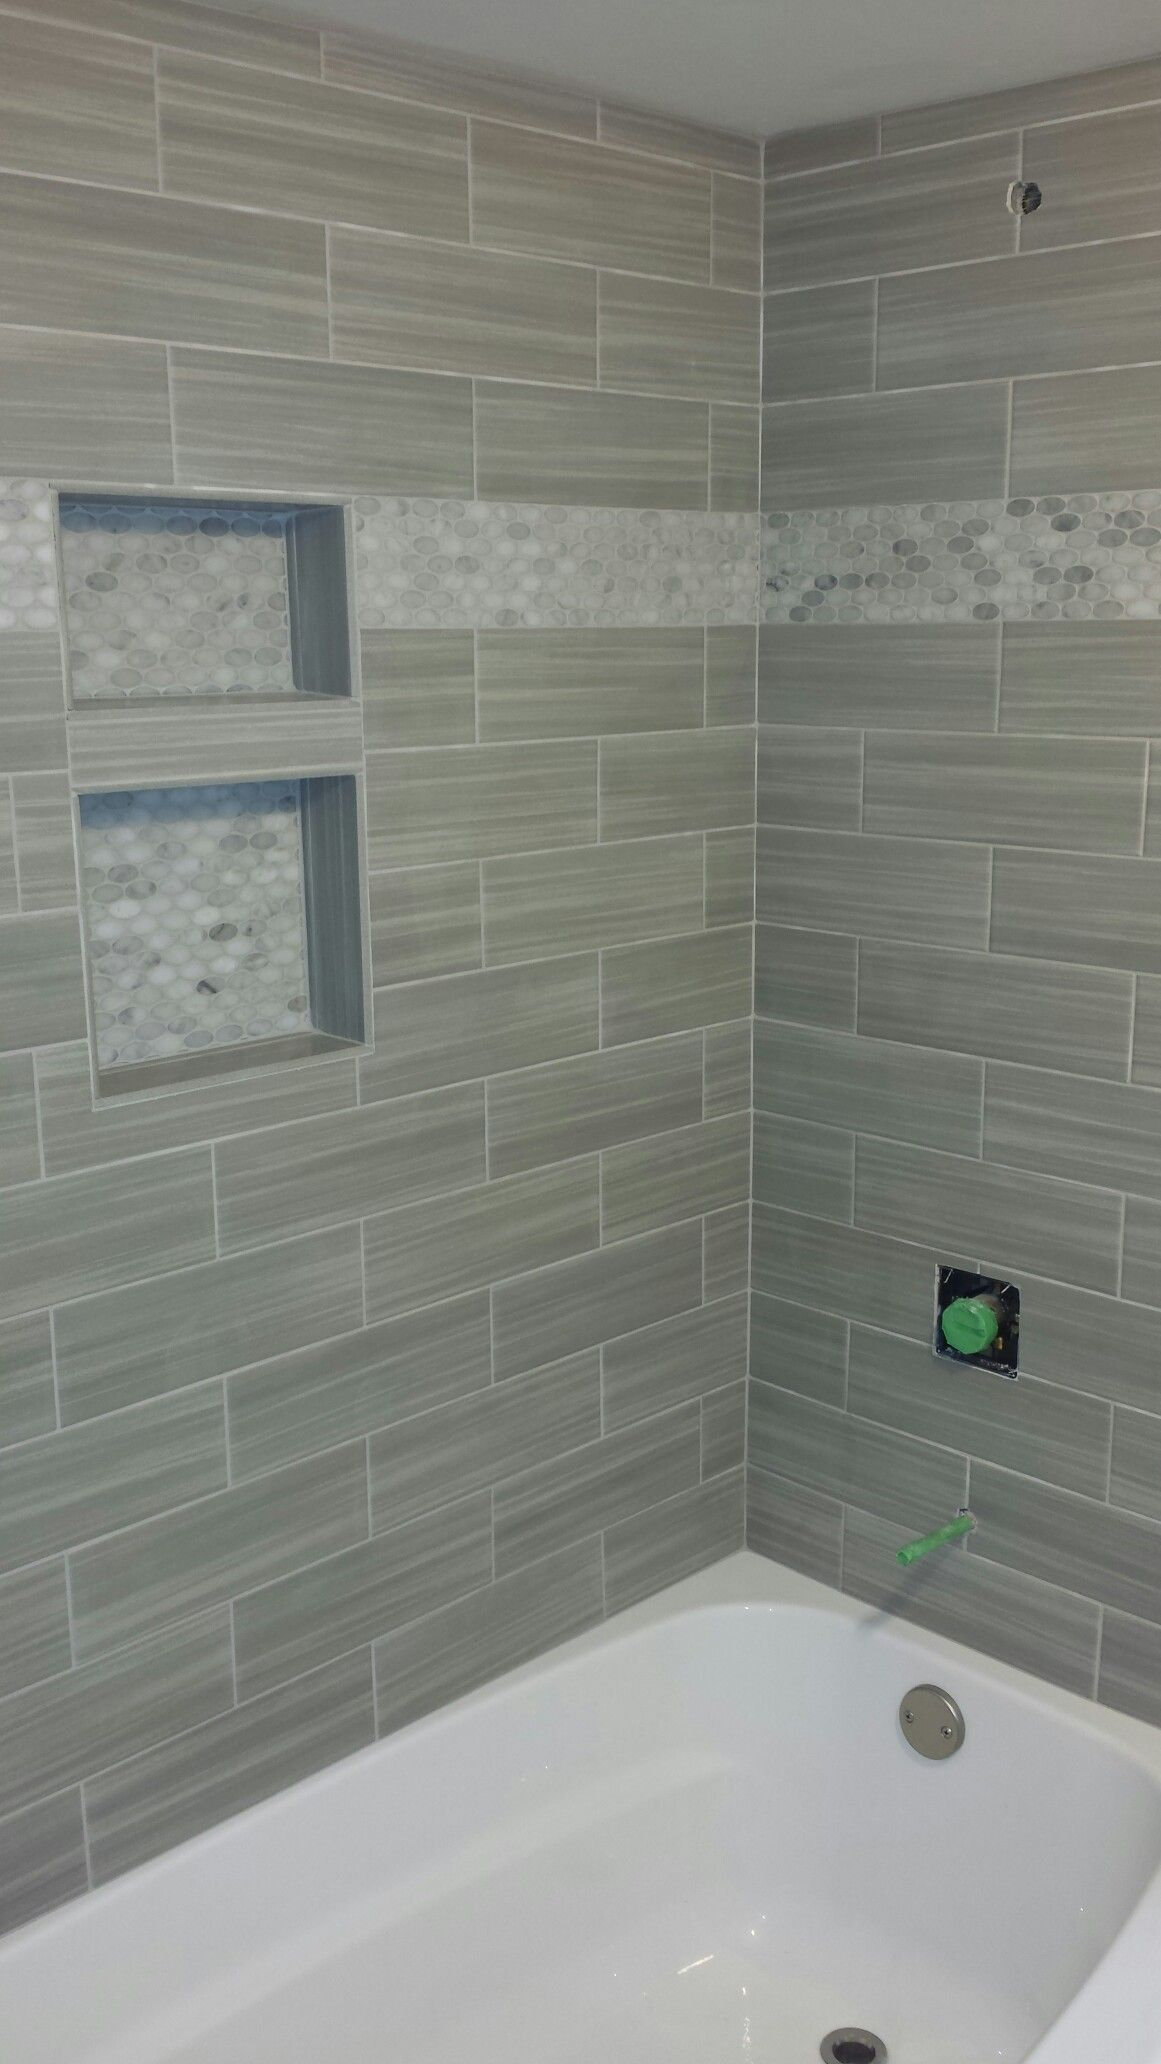 White Subway Tile With Mosaic Border | Tile Design Ideas